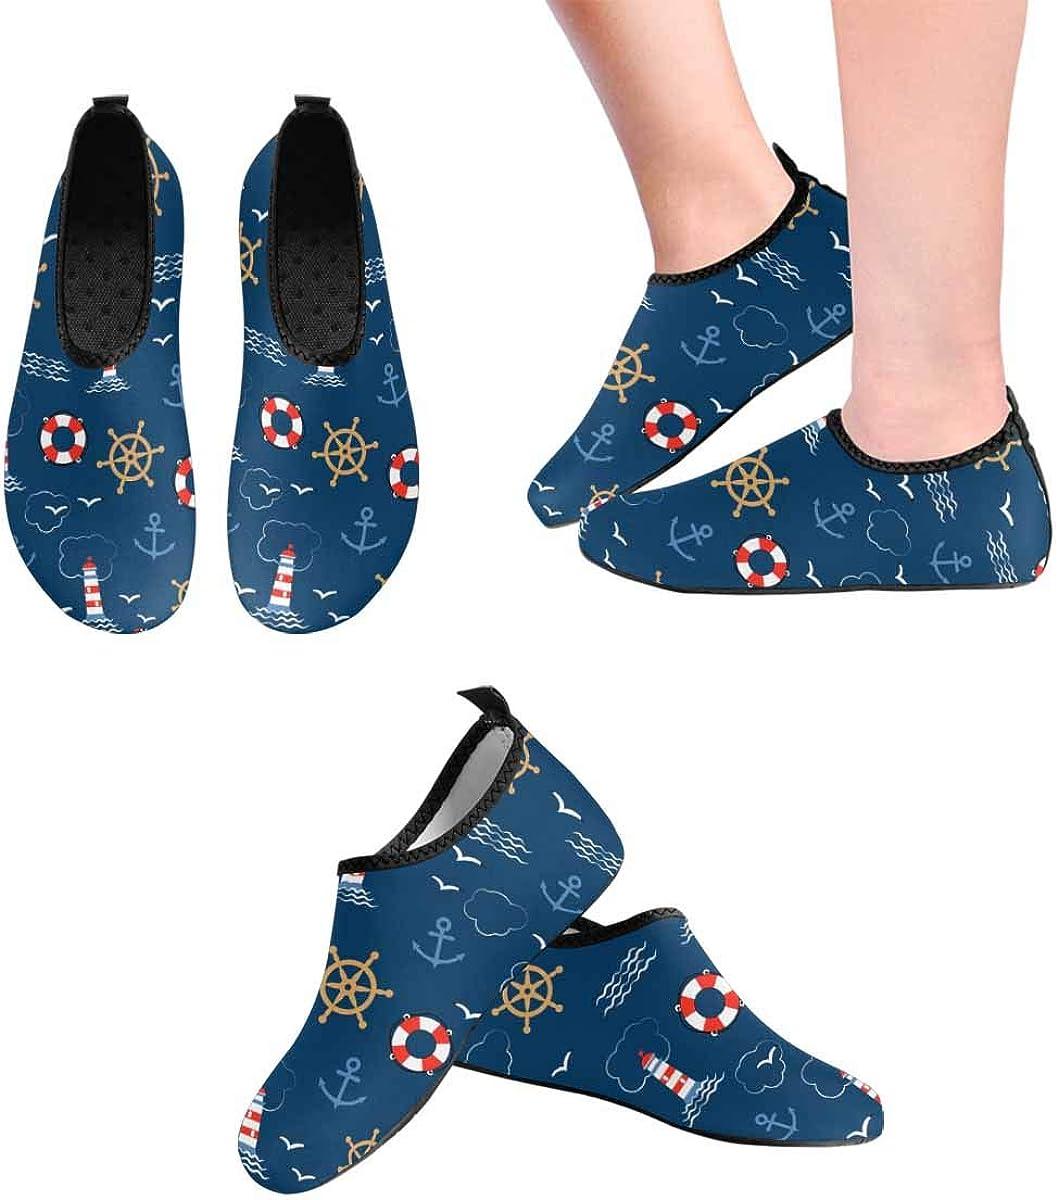 INTERESTPRINT Mens Water Shoes Swim Socks Anchors Seagulls Athletic Aqua Water Shoes Socks